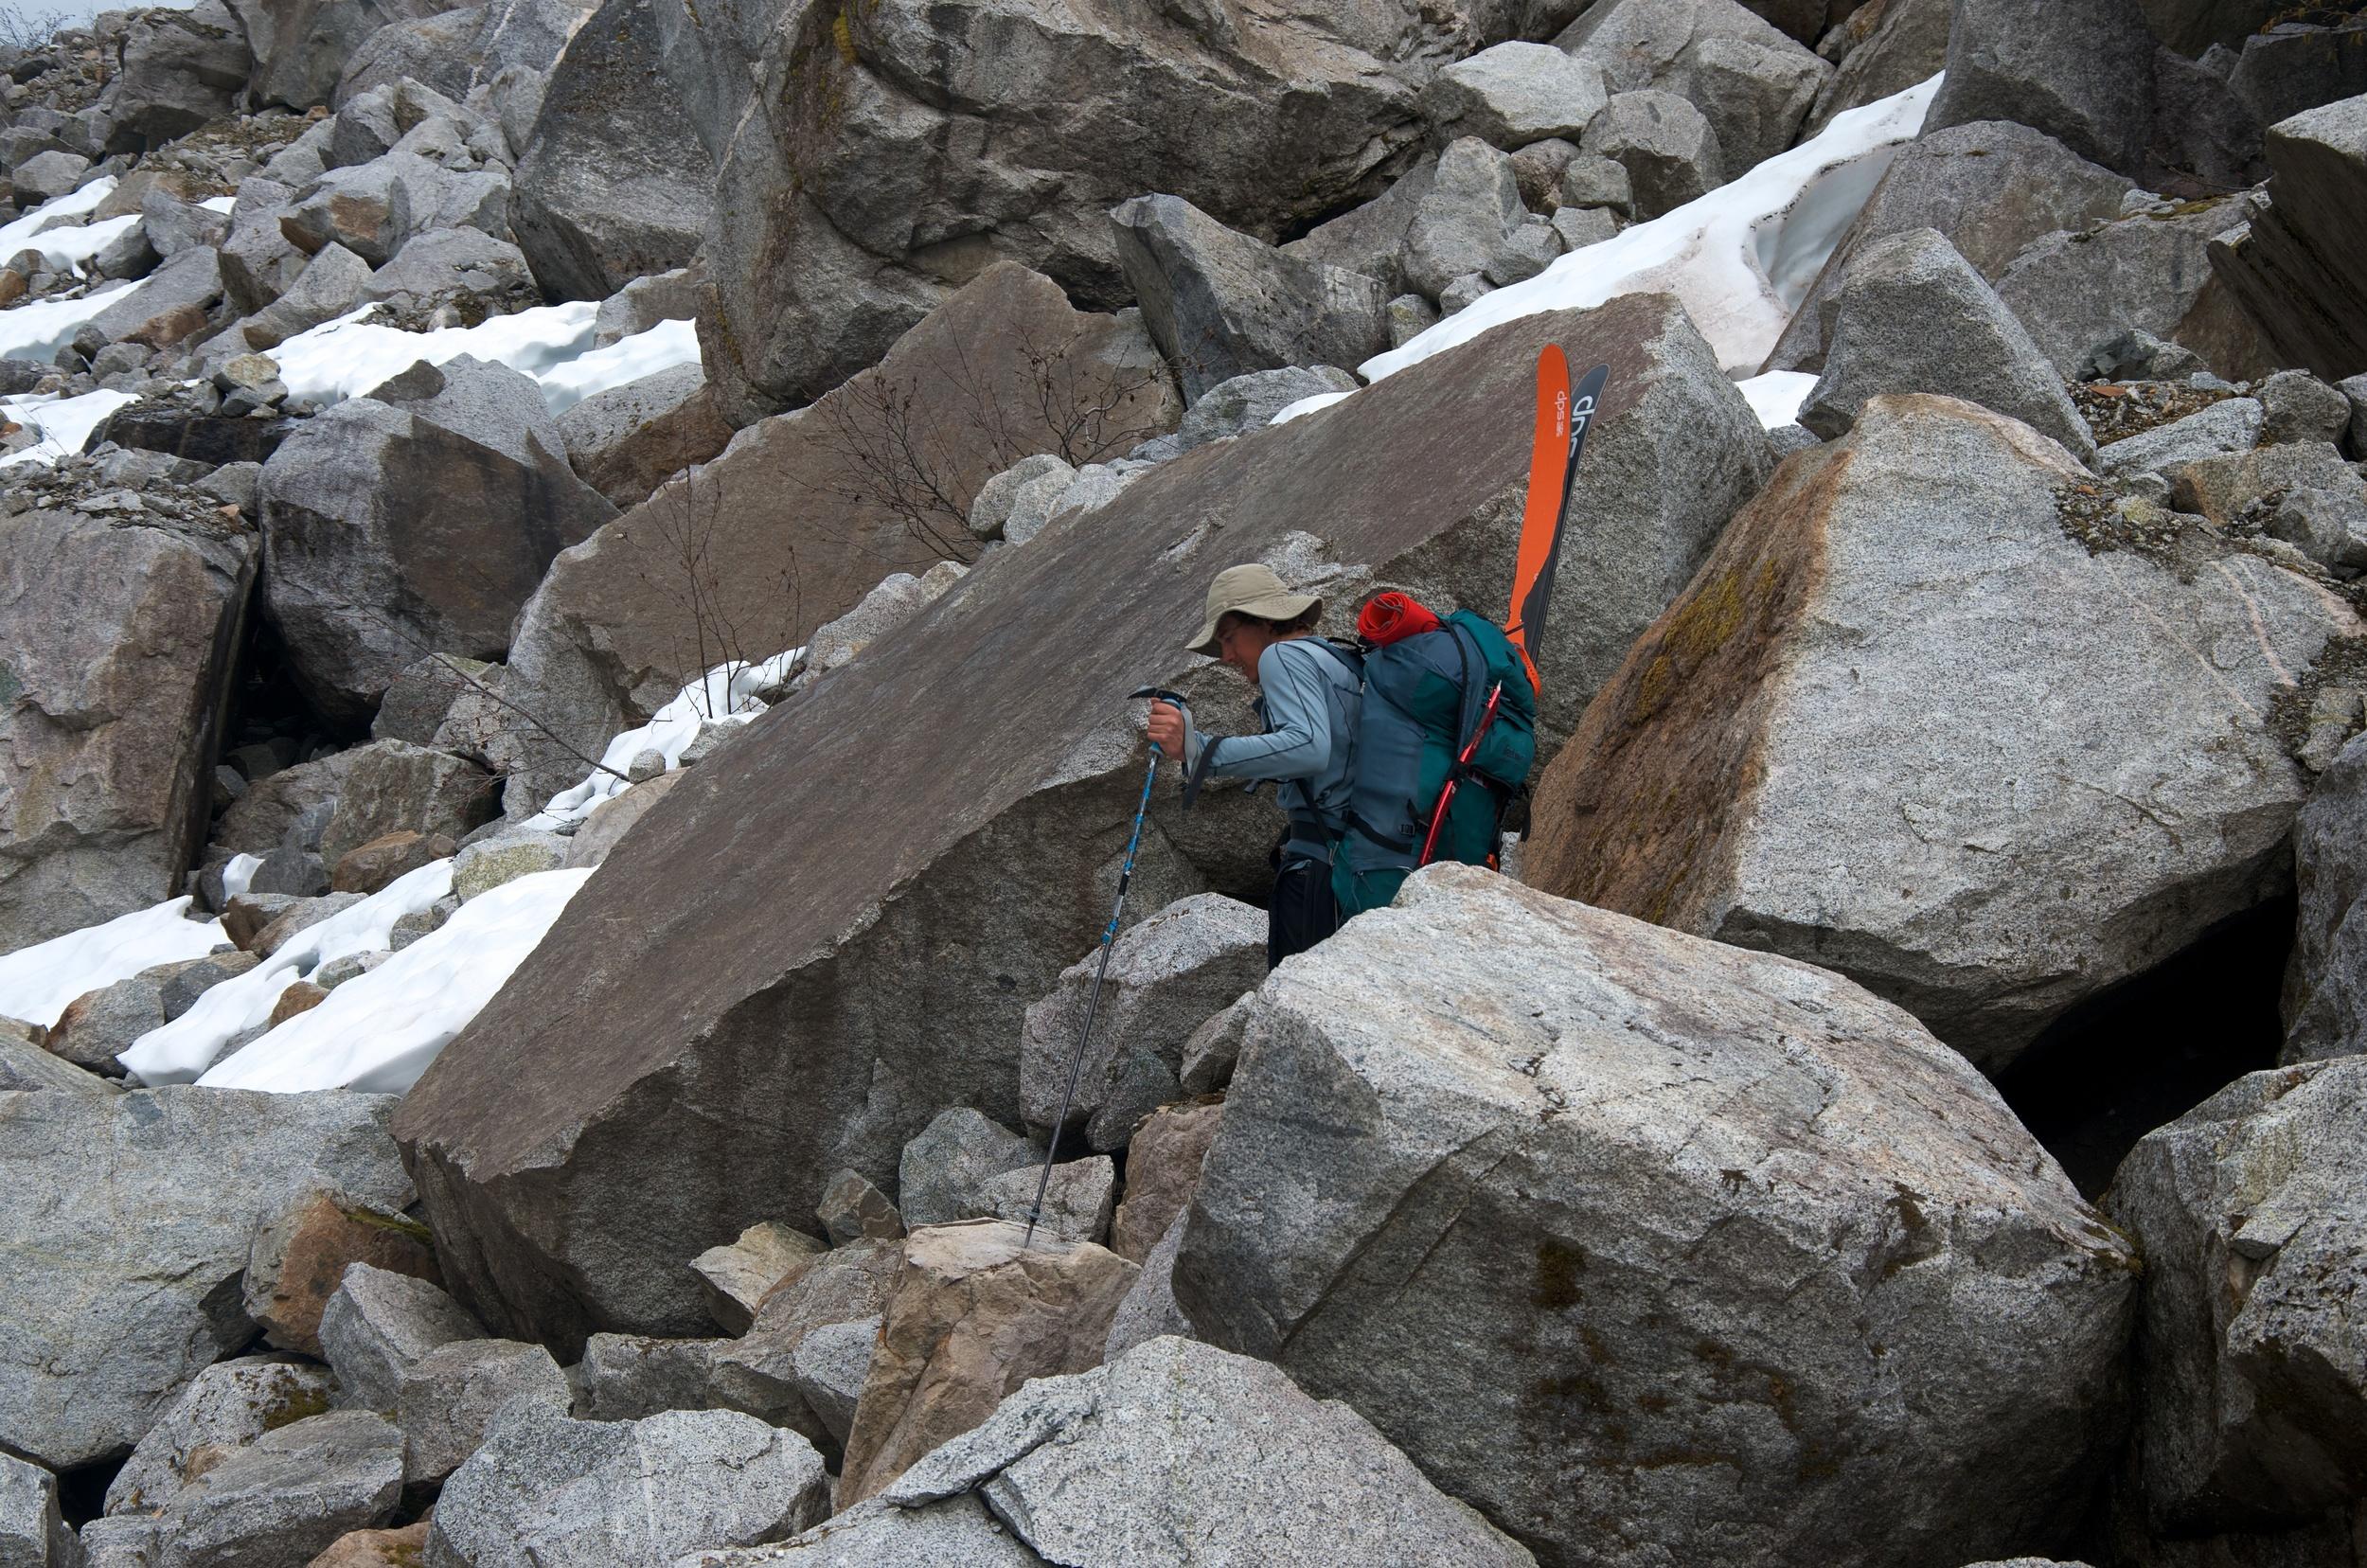 Artem amongst the boulders.